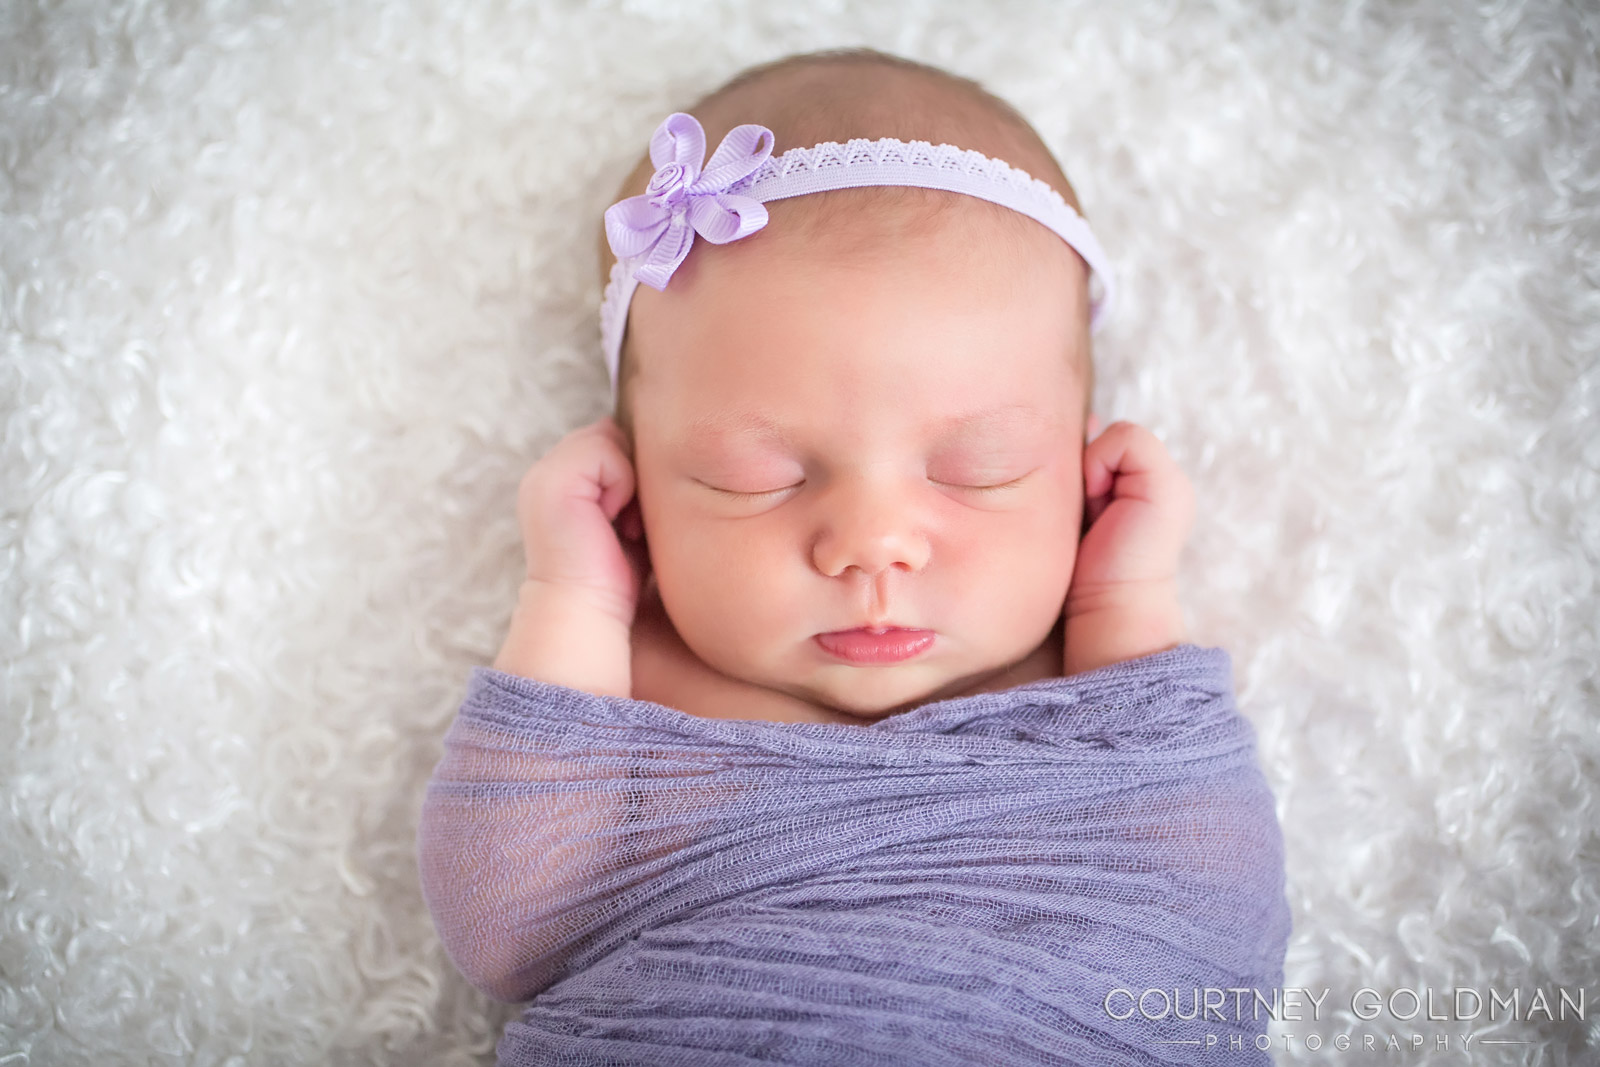 Atlanta Maternity and Newborn Photography by Courtney Goldman 61.jpg